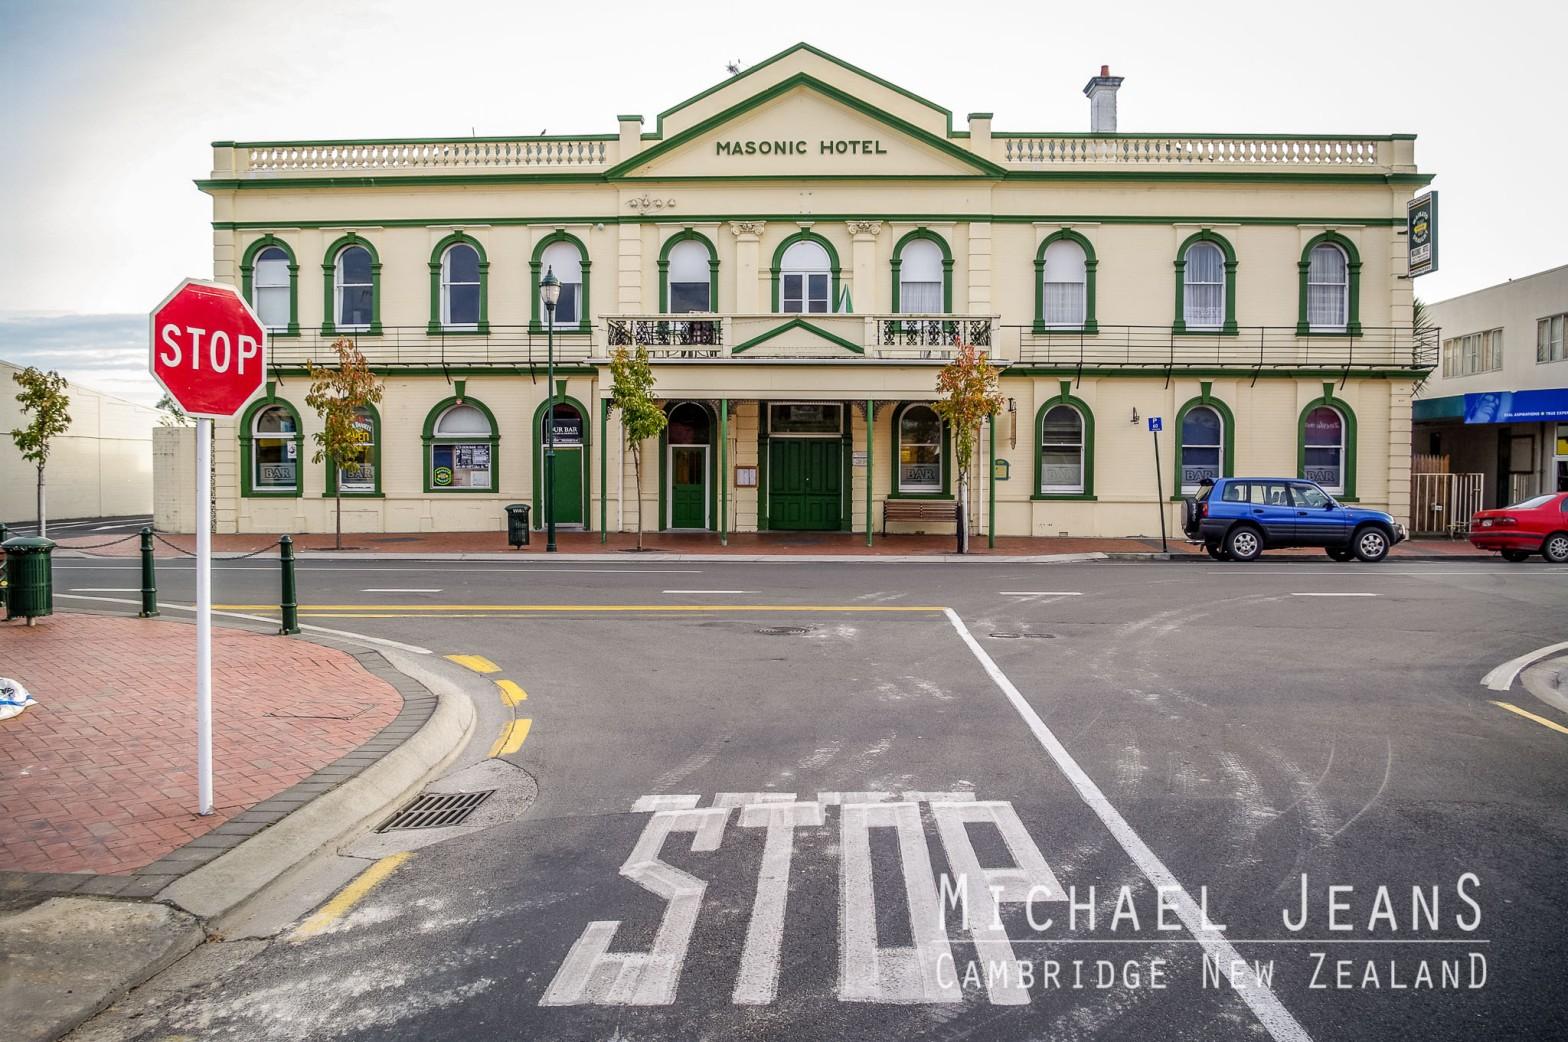 Masonic Hotel Cambridge New Zealand